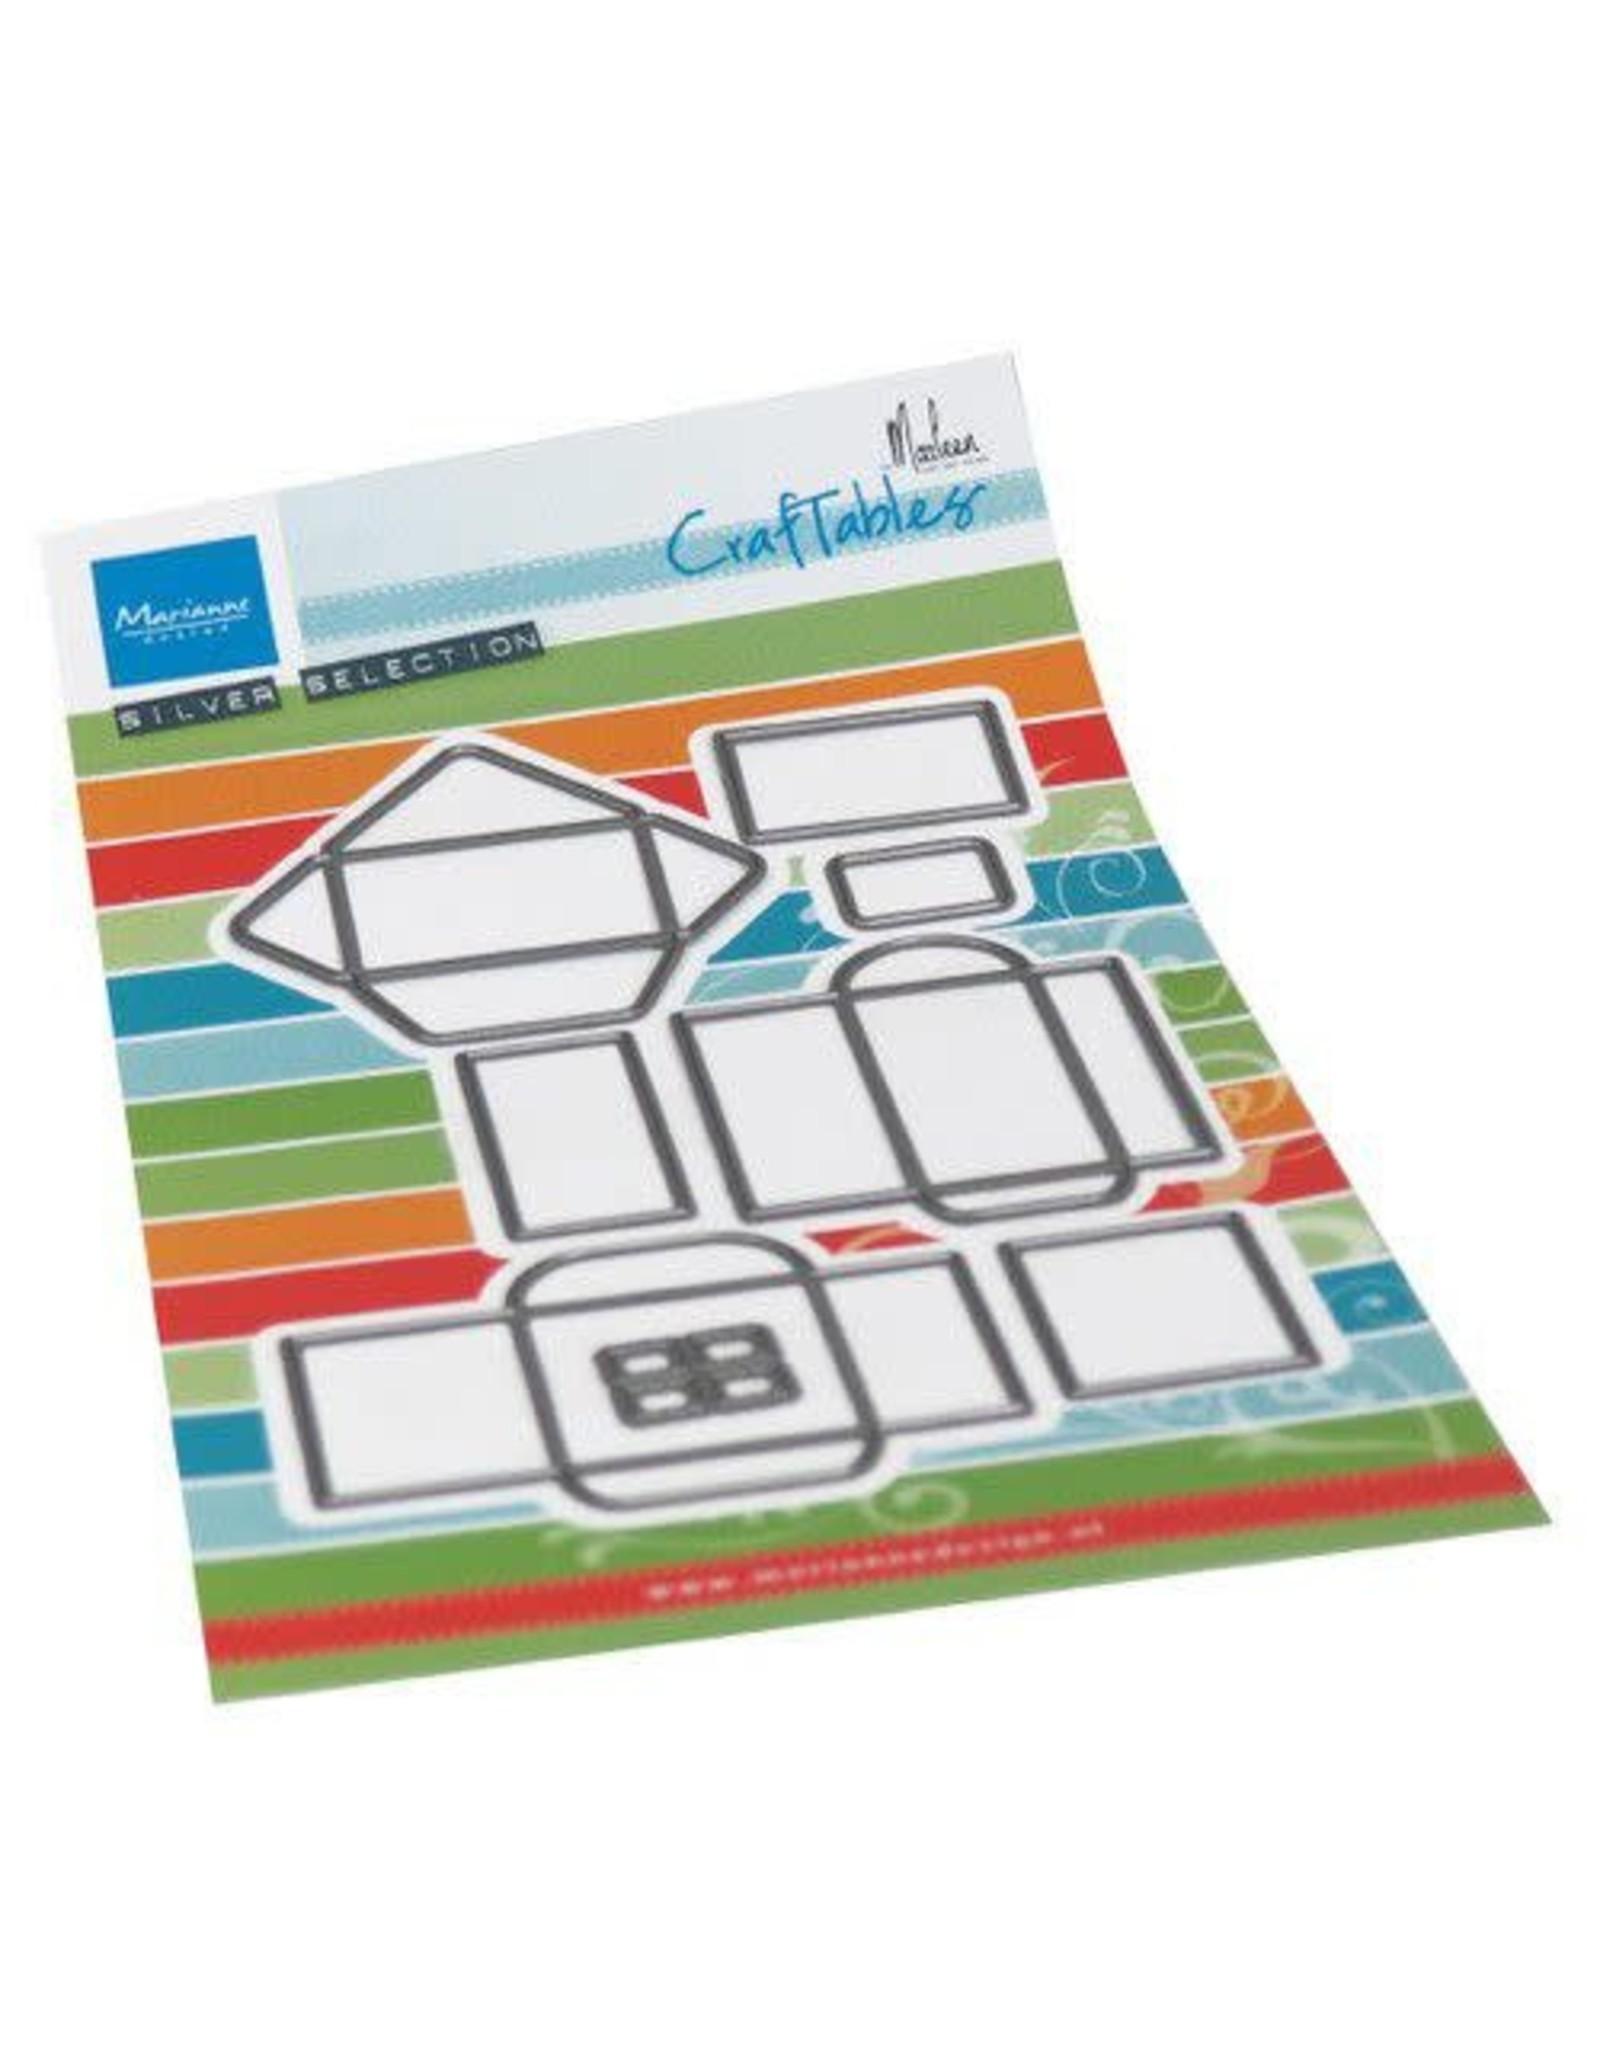 Marianne Design Marianne D Craftable Envelop set by Marleen CR1518 120x205 mm